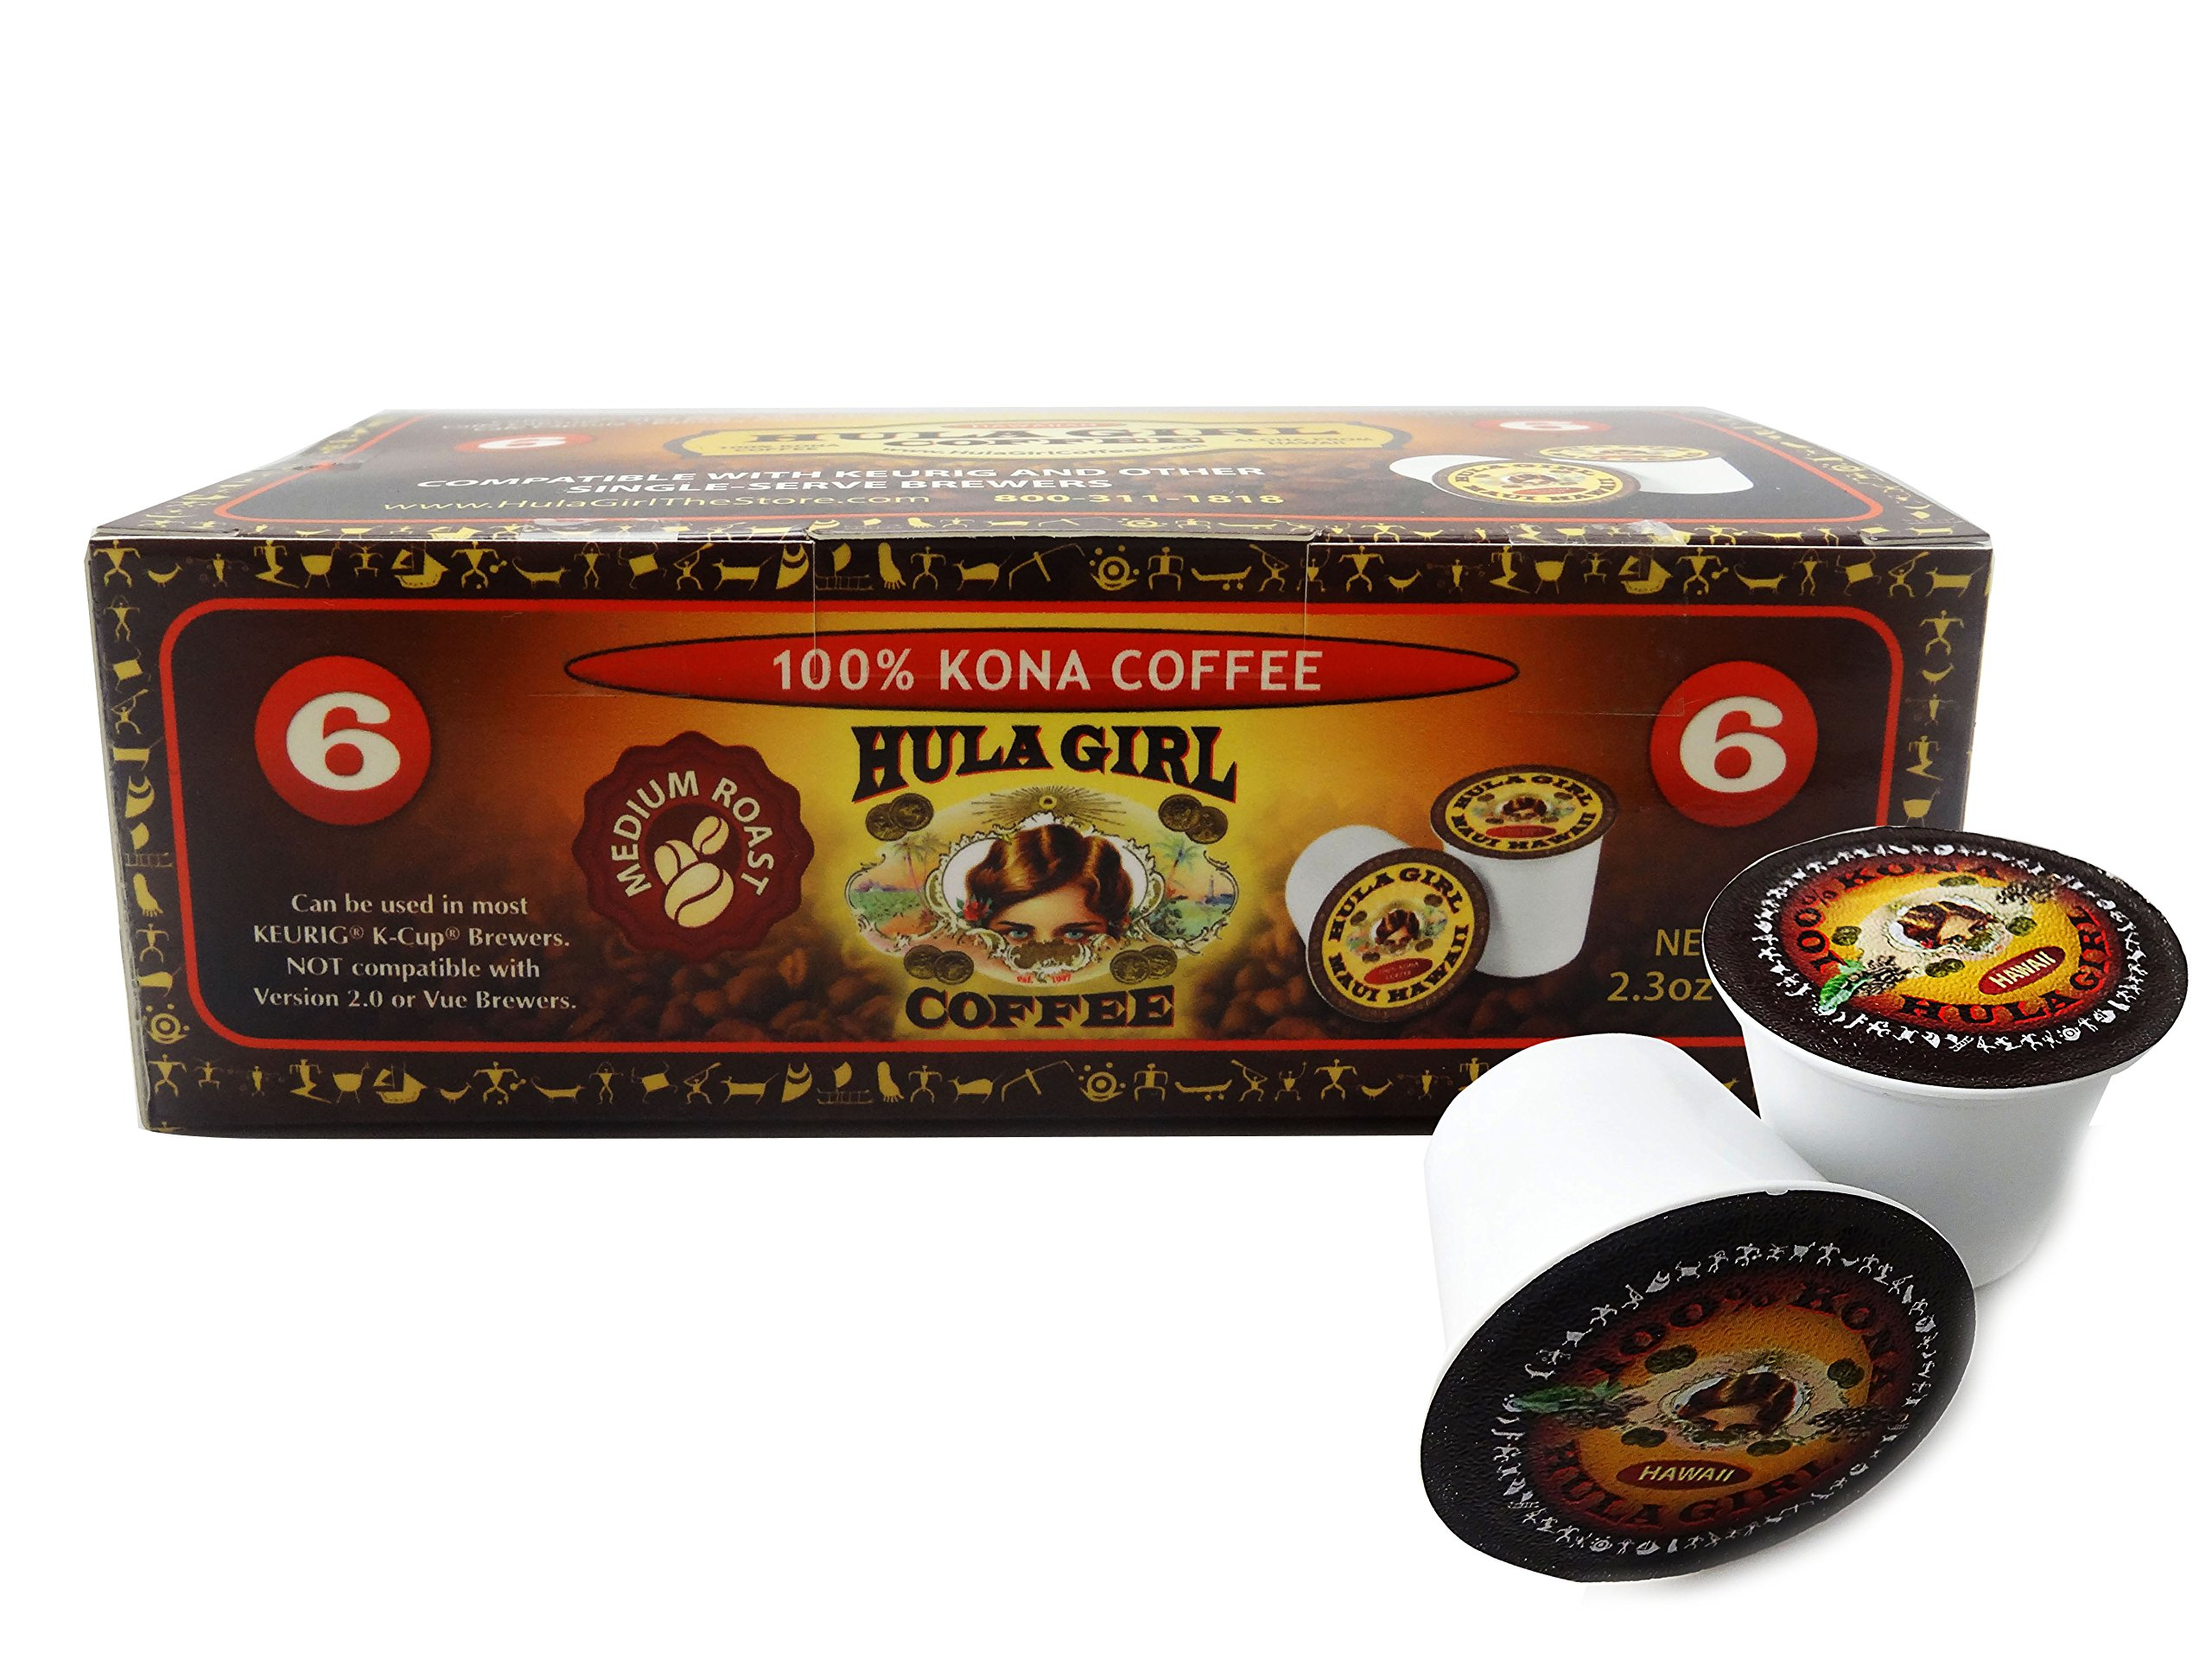 Hula Girl K2 Compatible 100% Kona Coffee Single Servings - K-Cup Box of 100